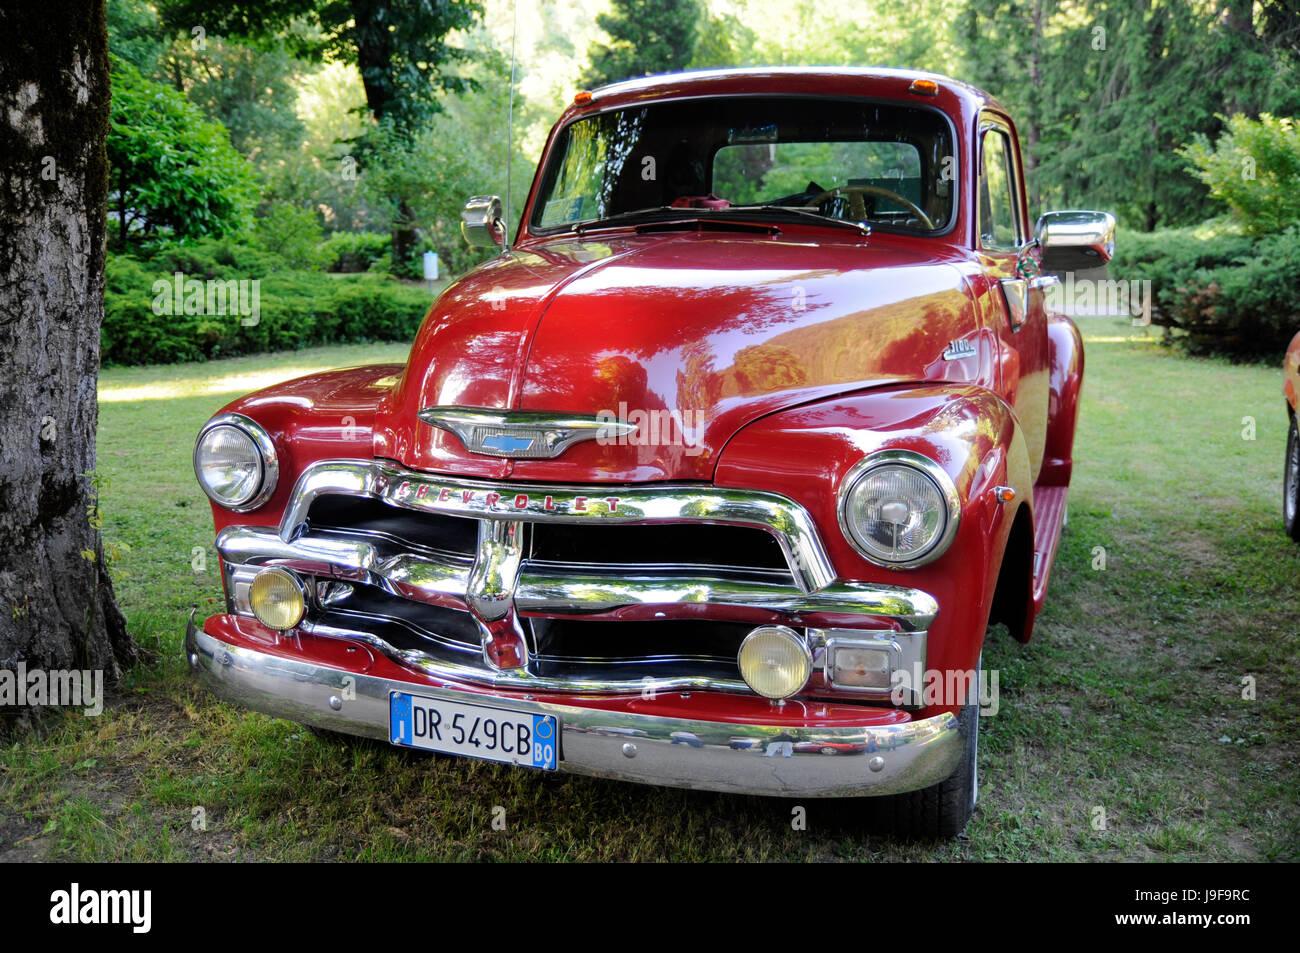 PORRETTA TERME, ITALY - June 2013 : classic old Chevrolet car on ...